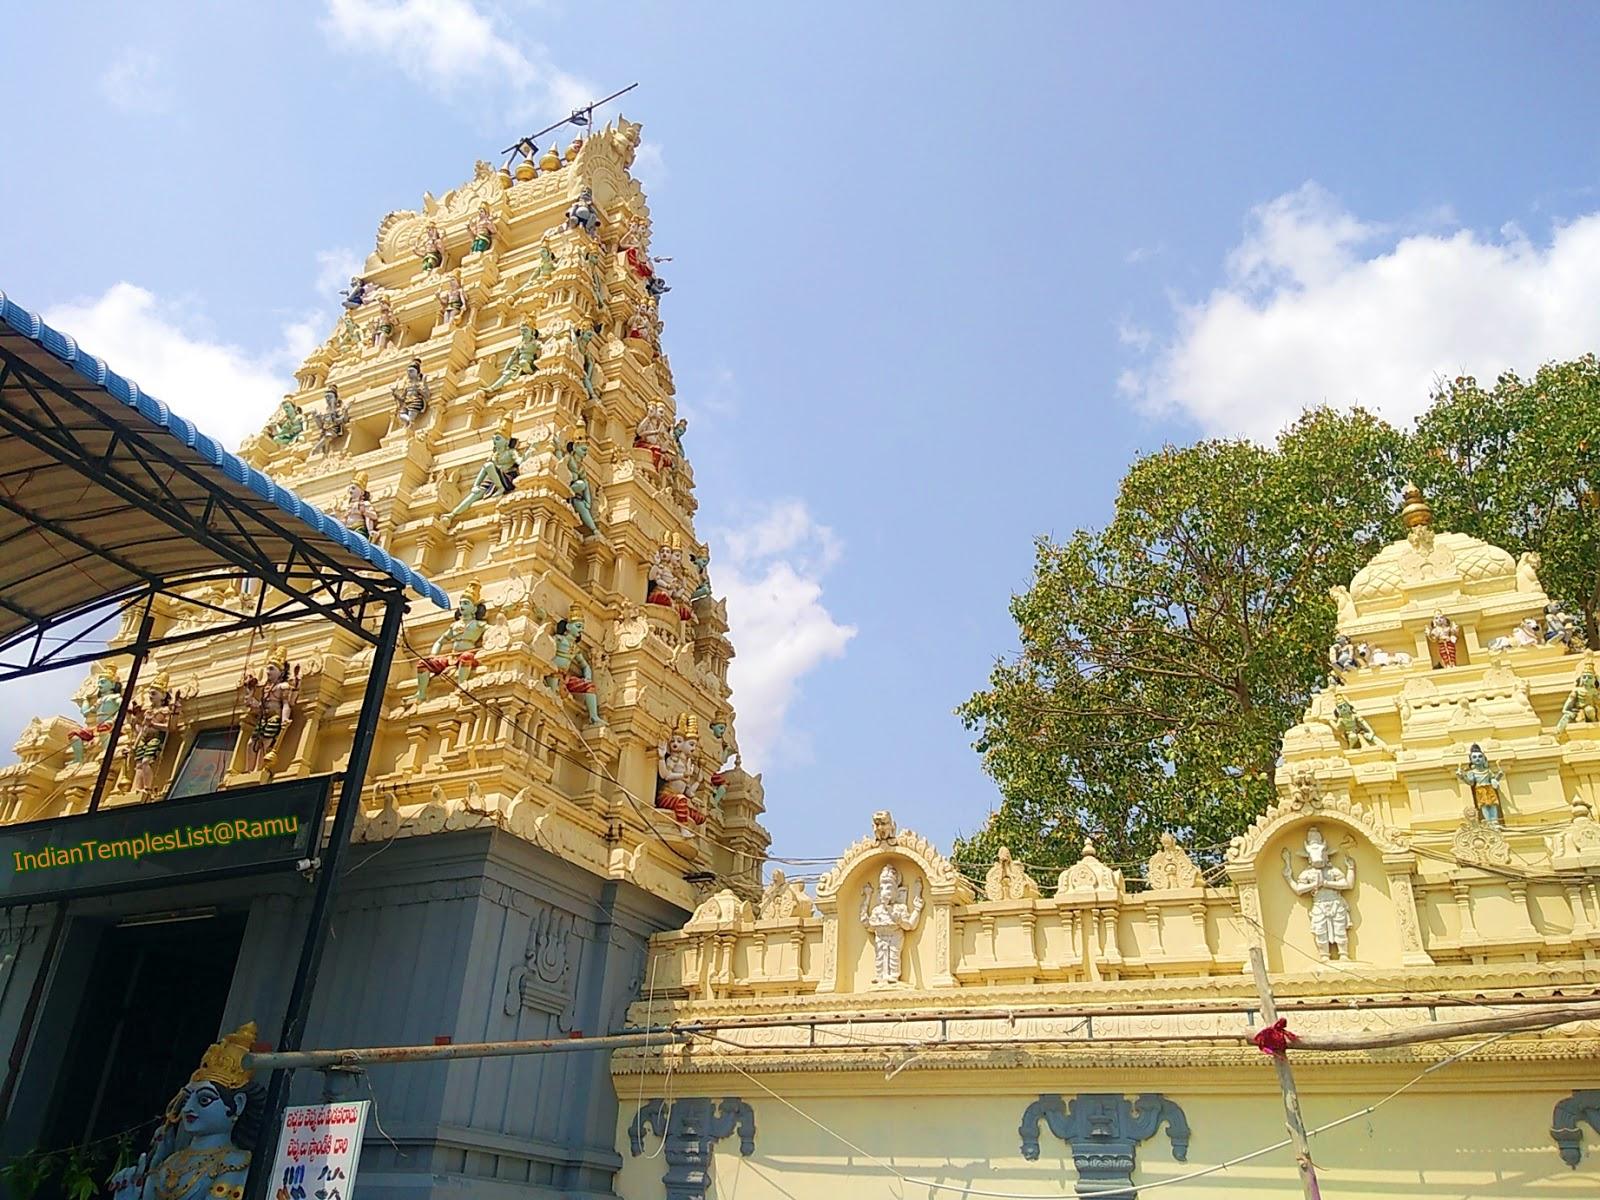 Attraction at Kanaka Durga Temple-Malleswara Swamy Temple